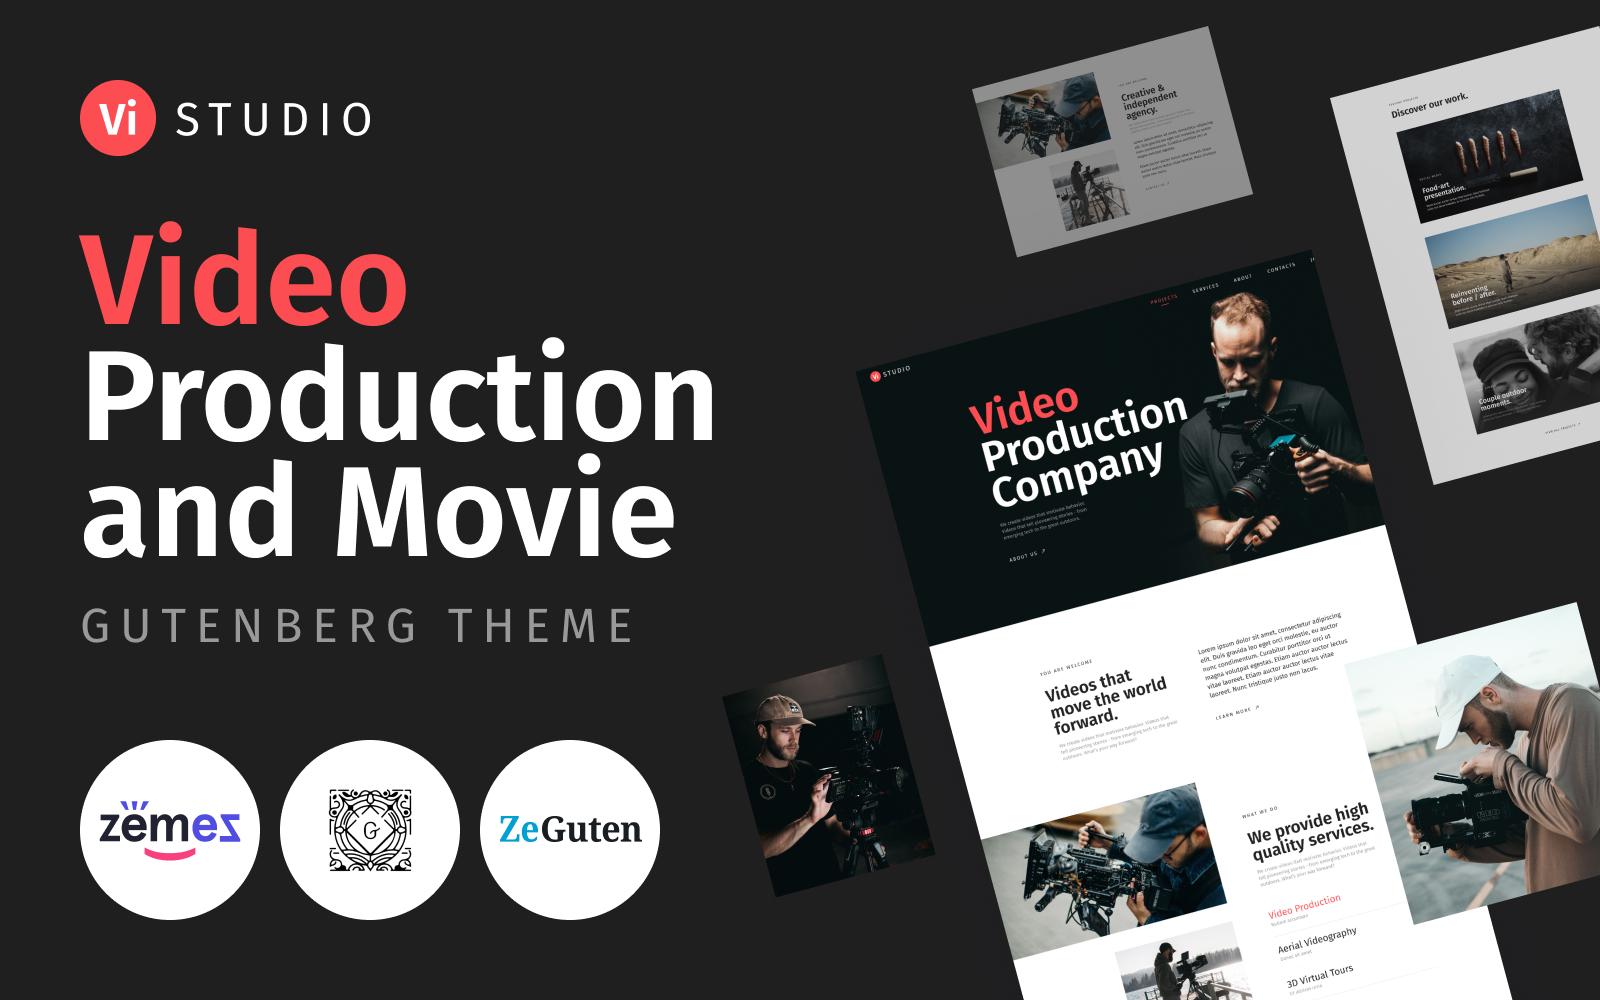 """Vistudio - Video Production and Movie"" thème WordPress adaptatif #116426"